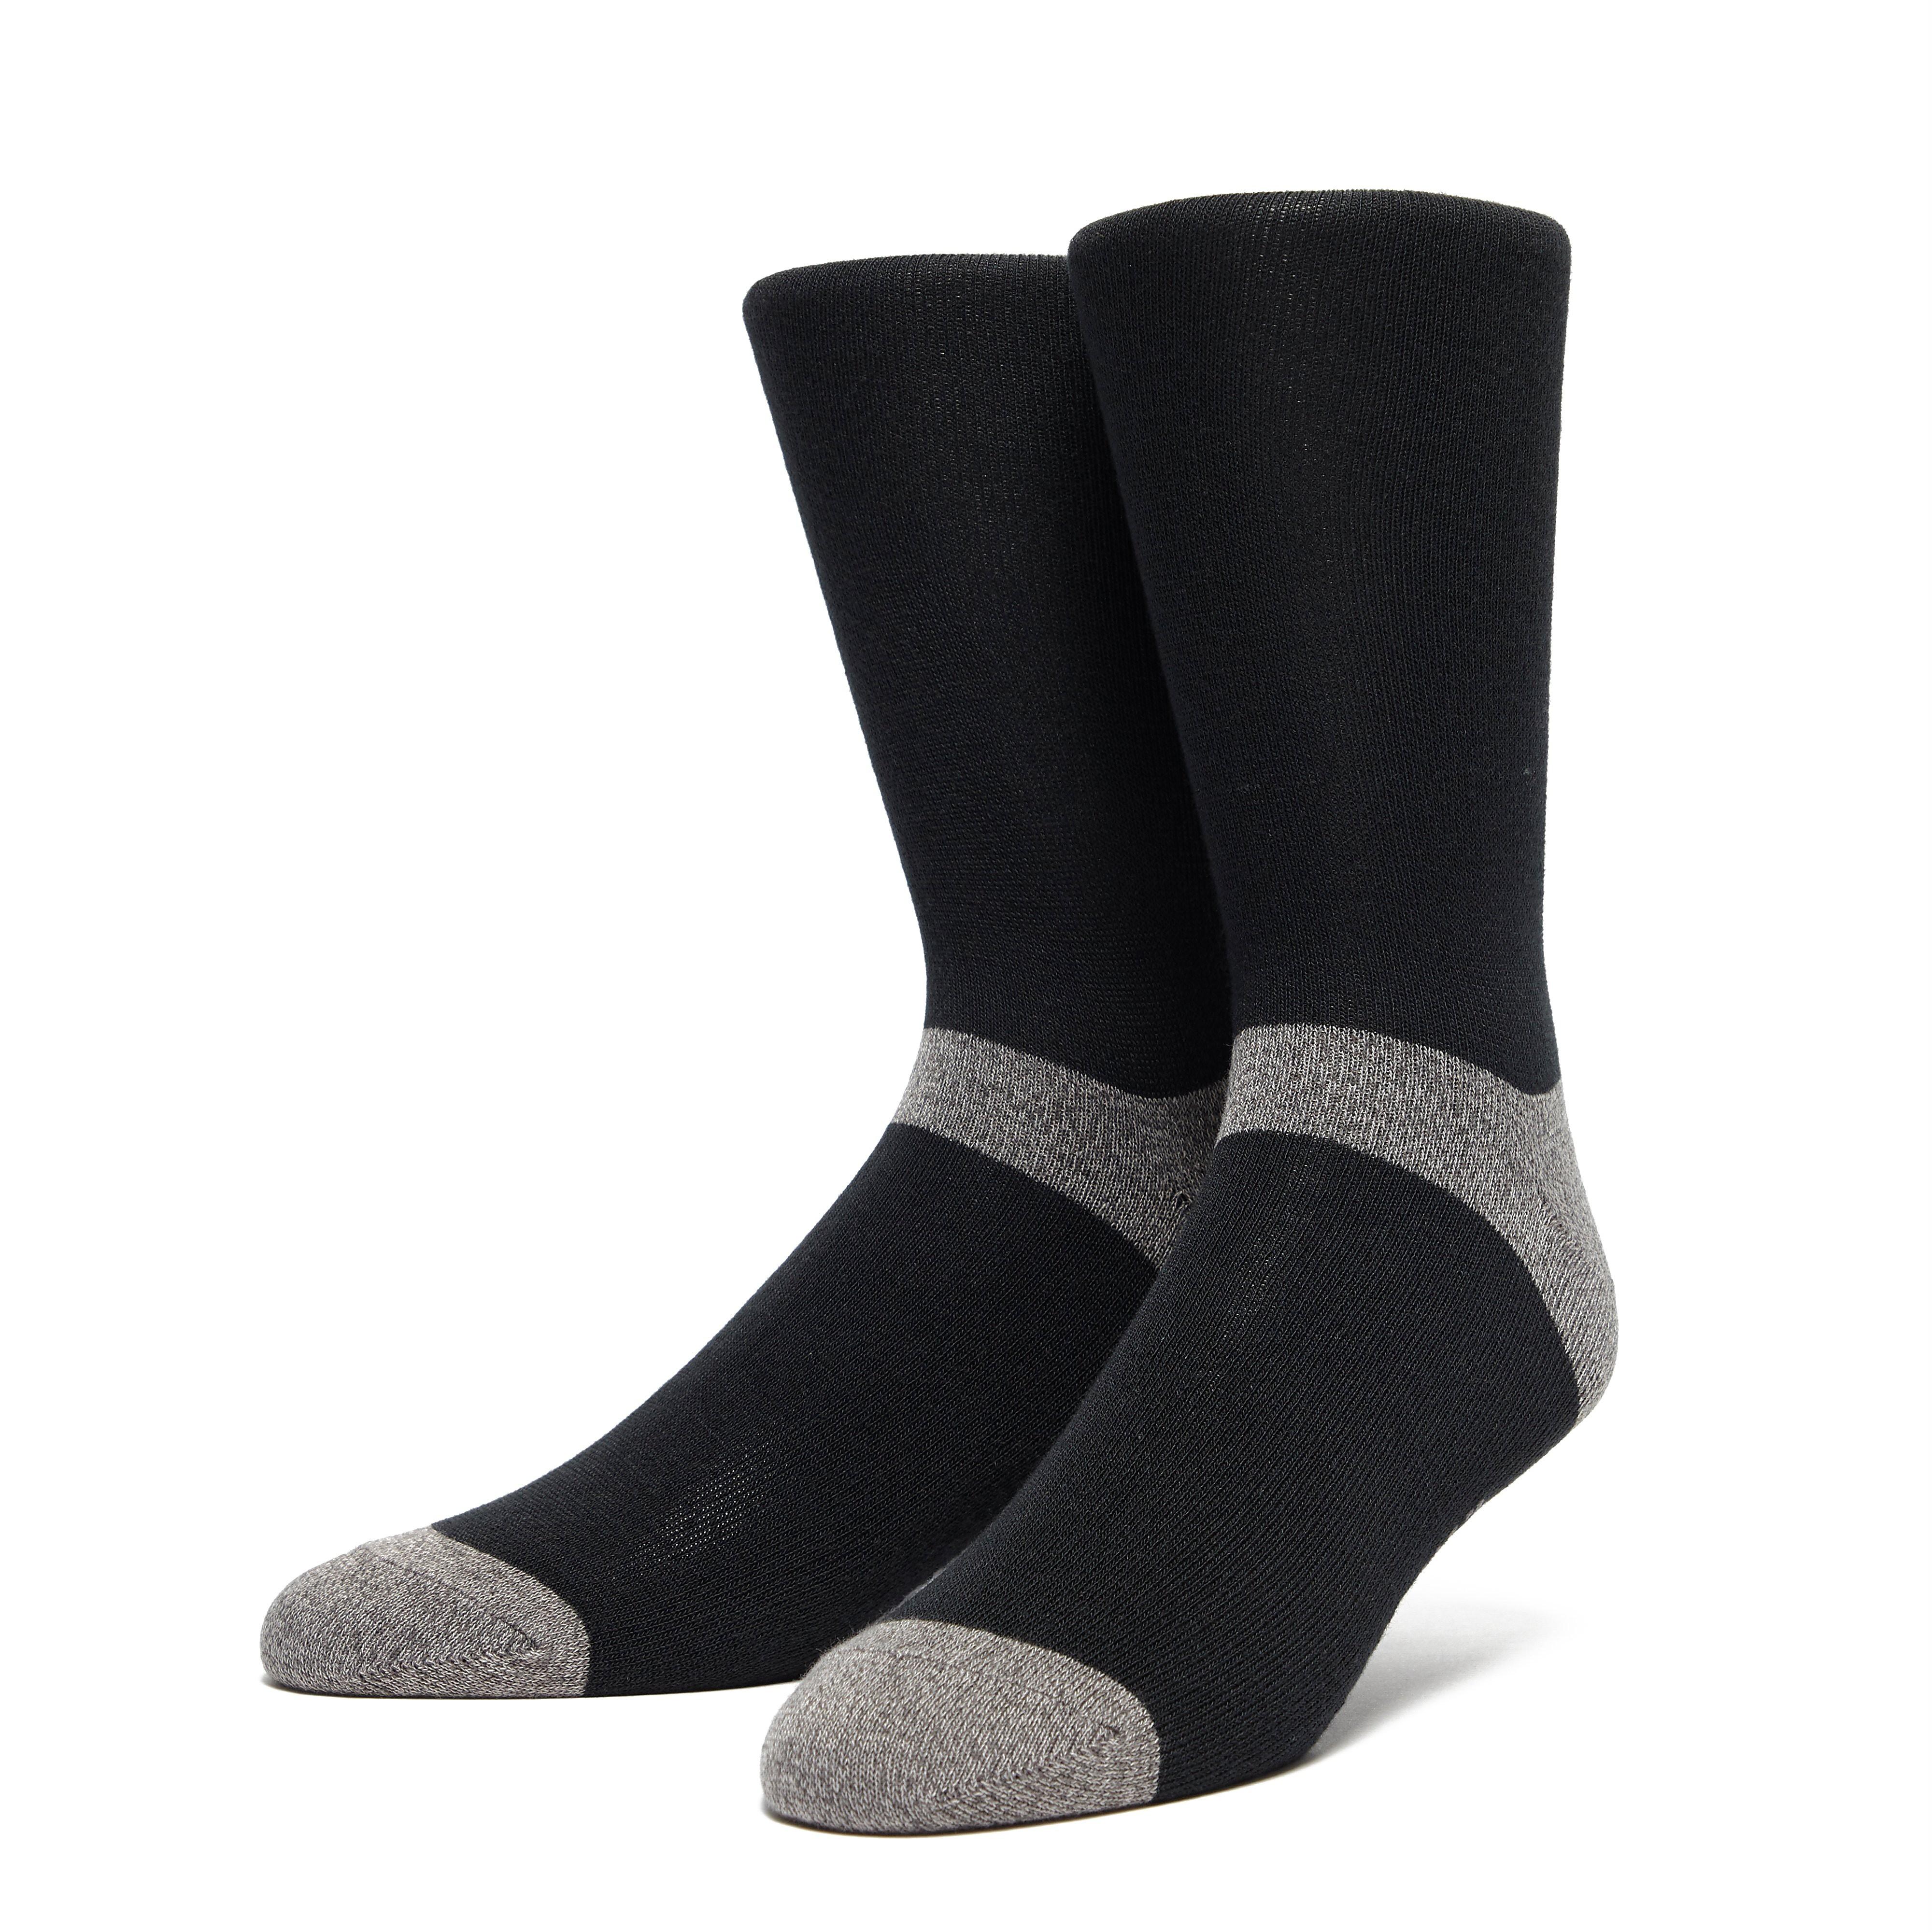 Peter Storm Unisex Multiactive Coolmax Liner Socks